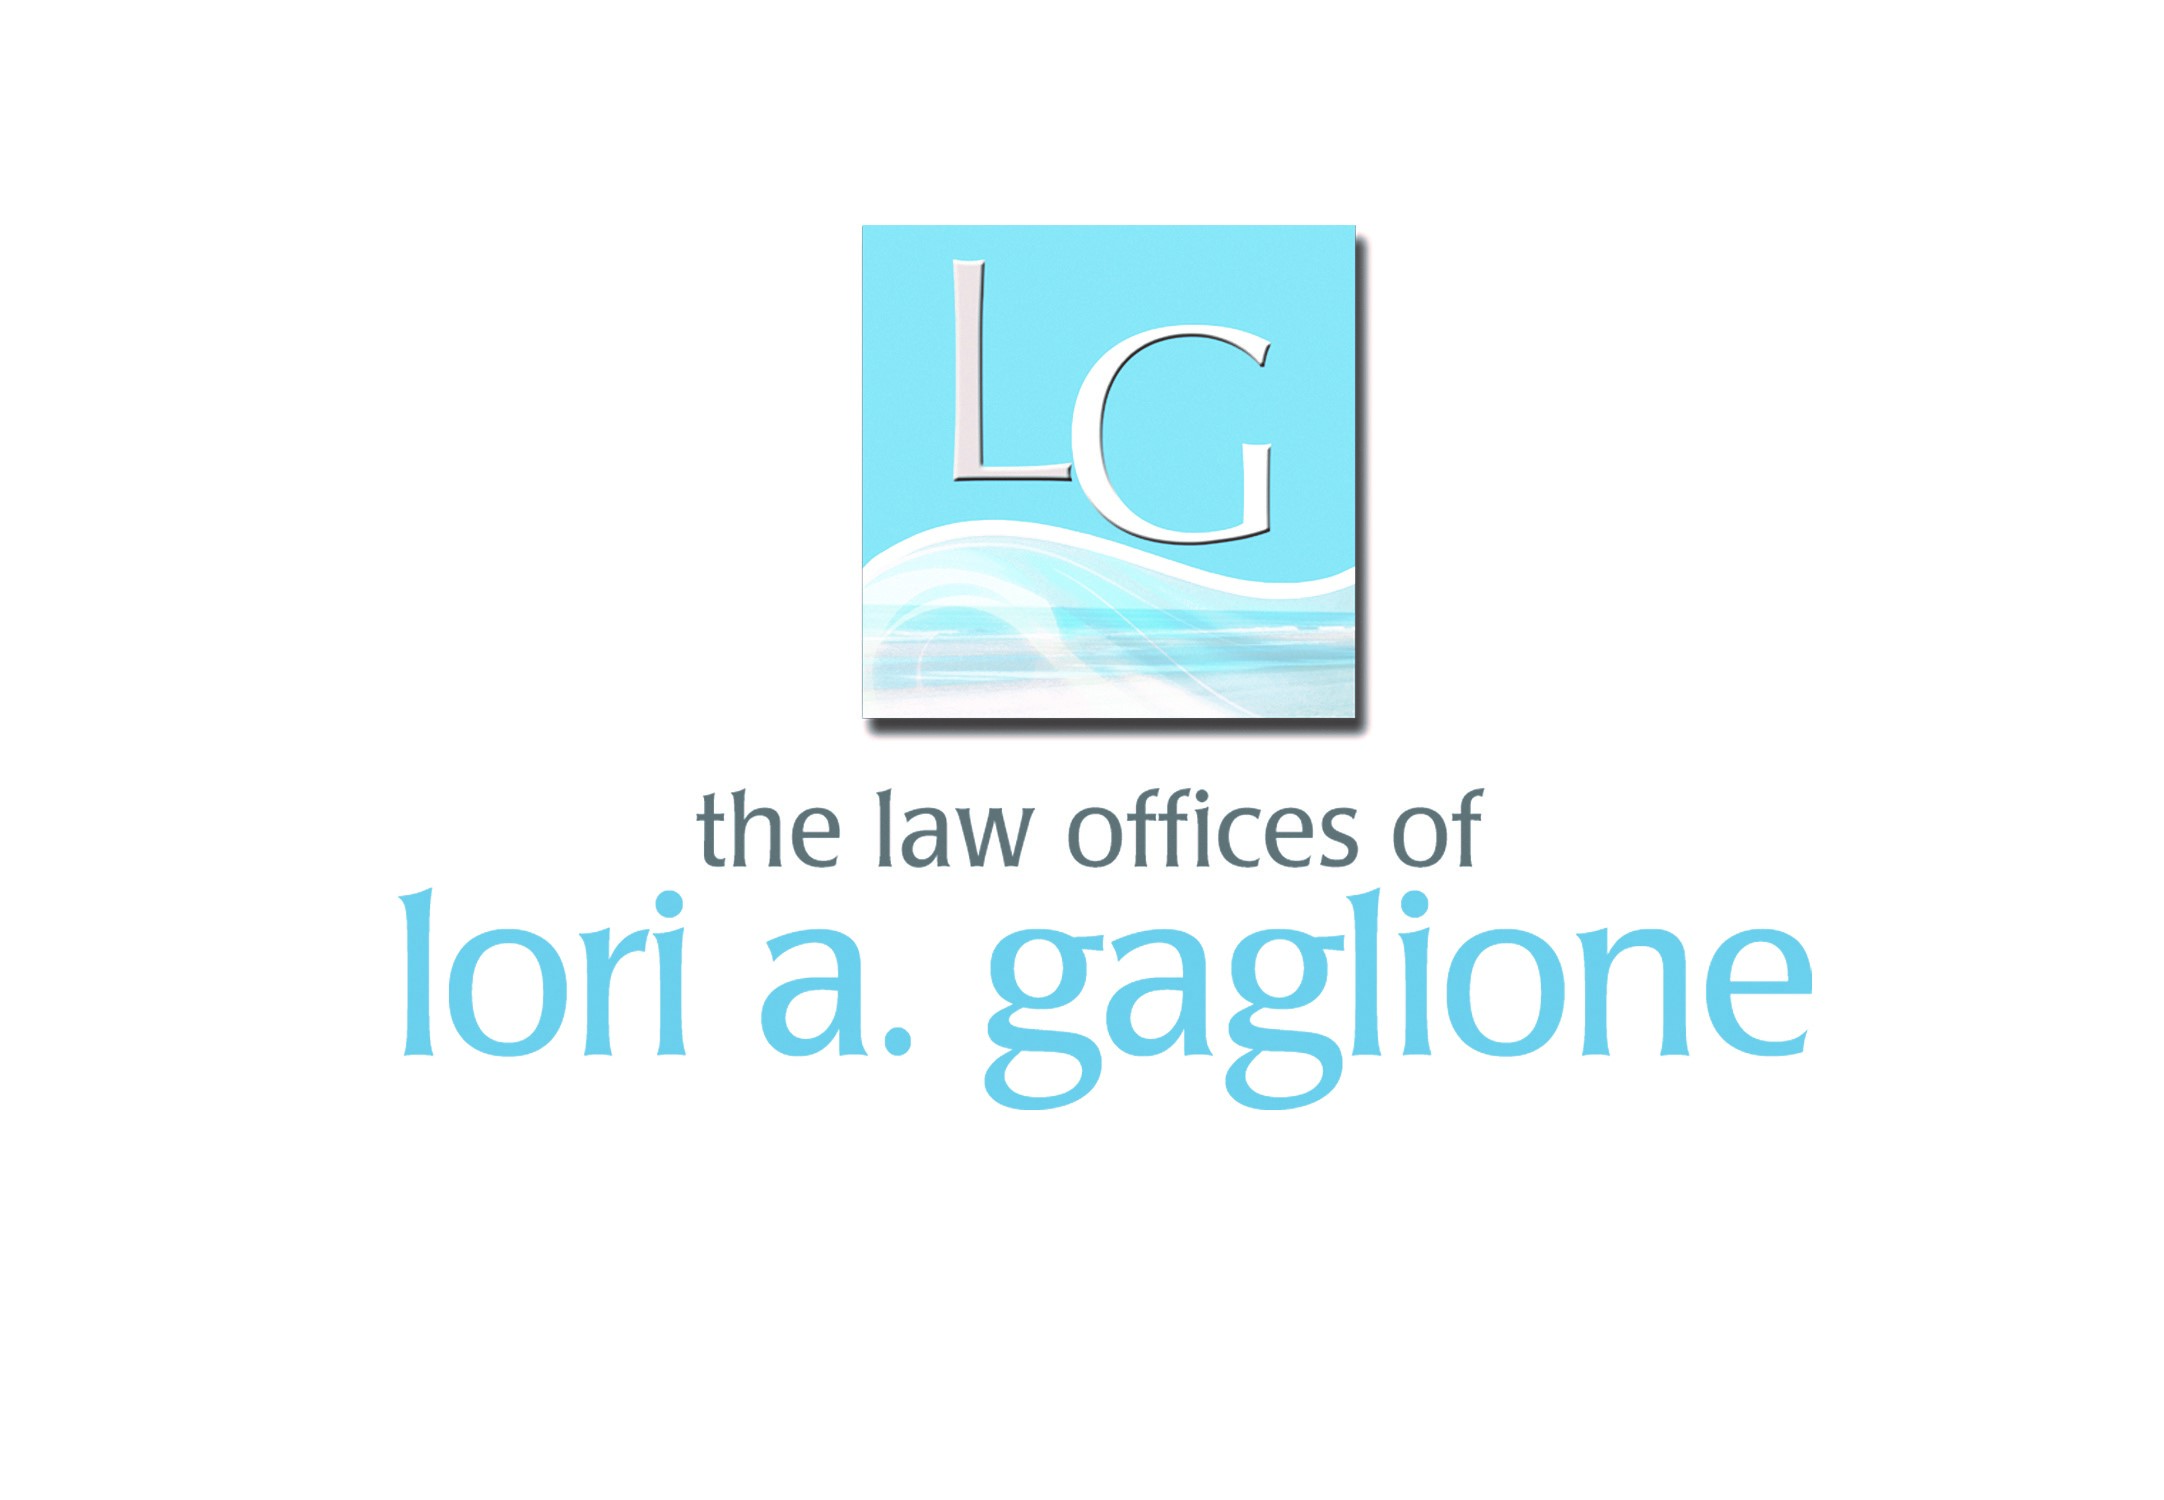 Lori Gaglione